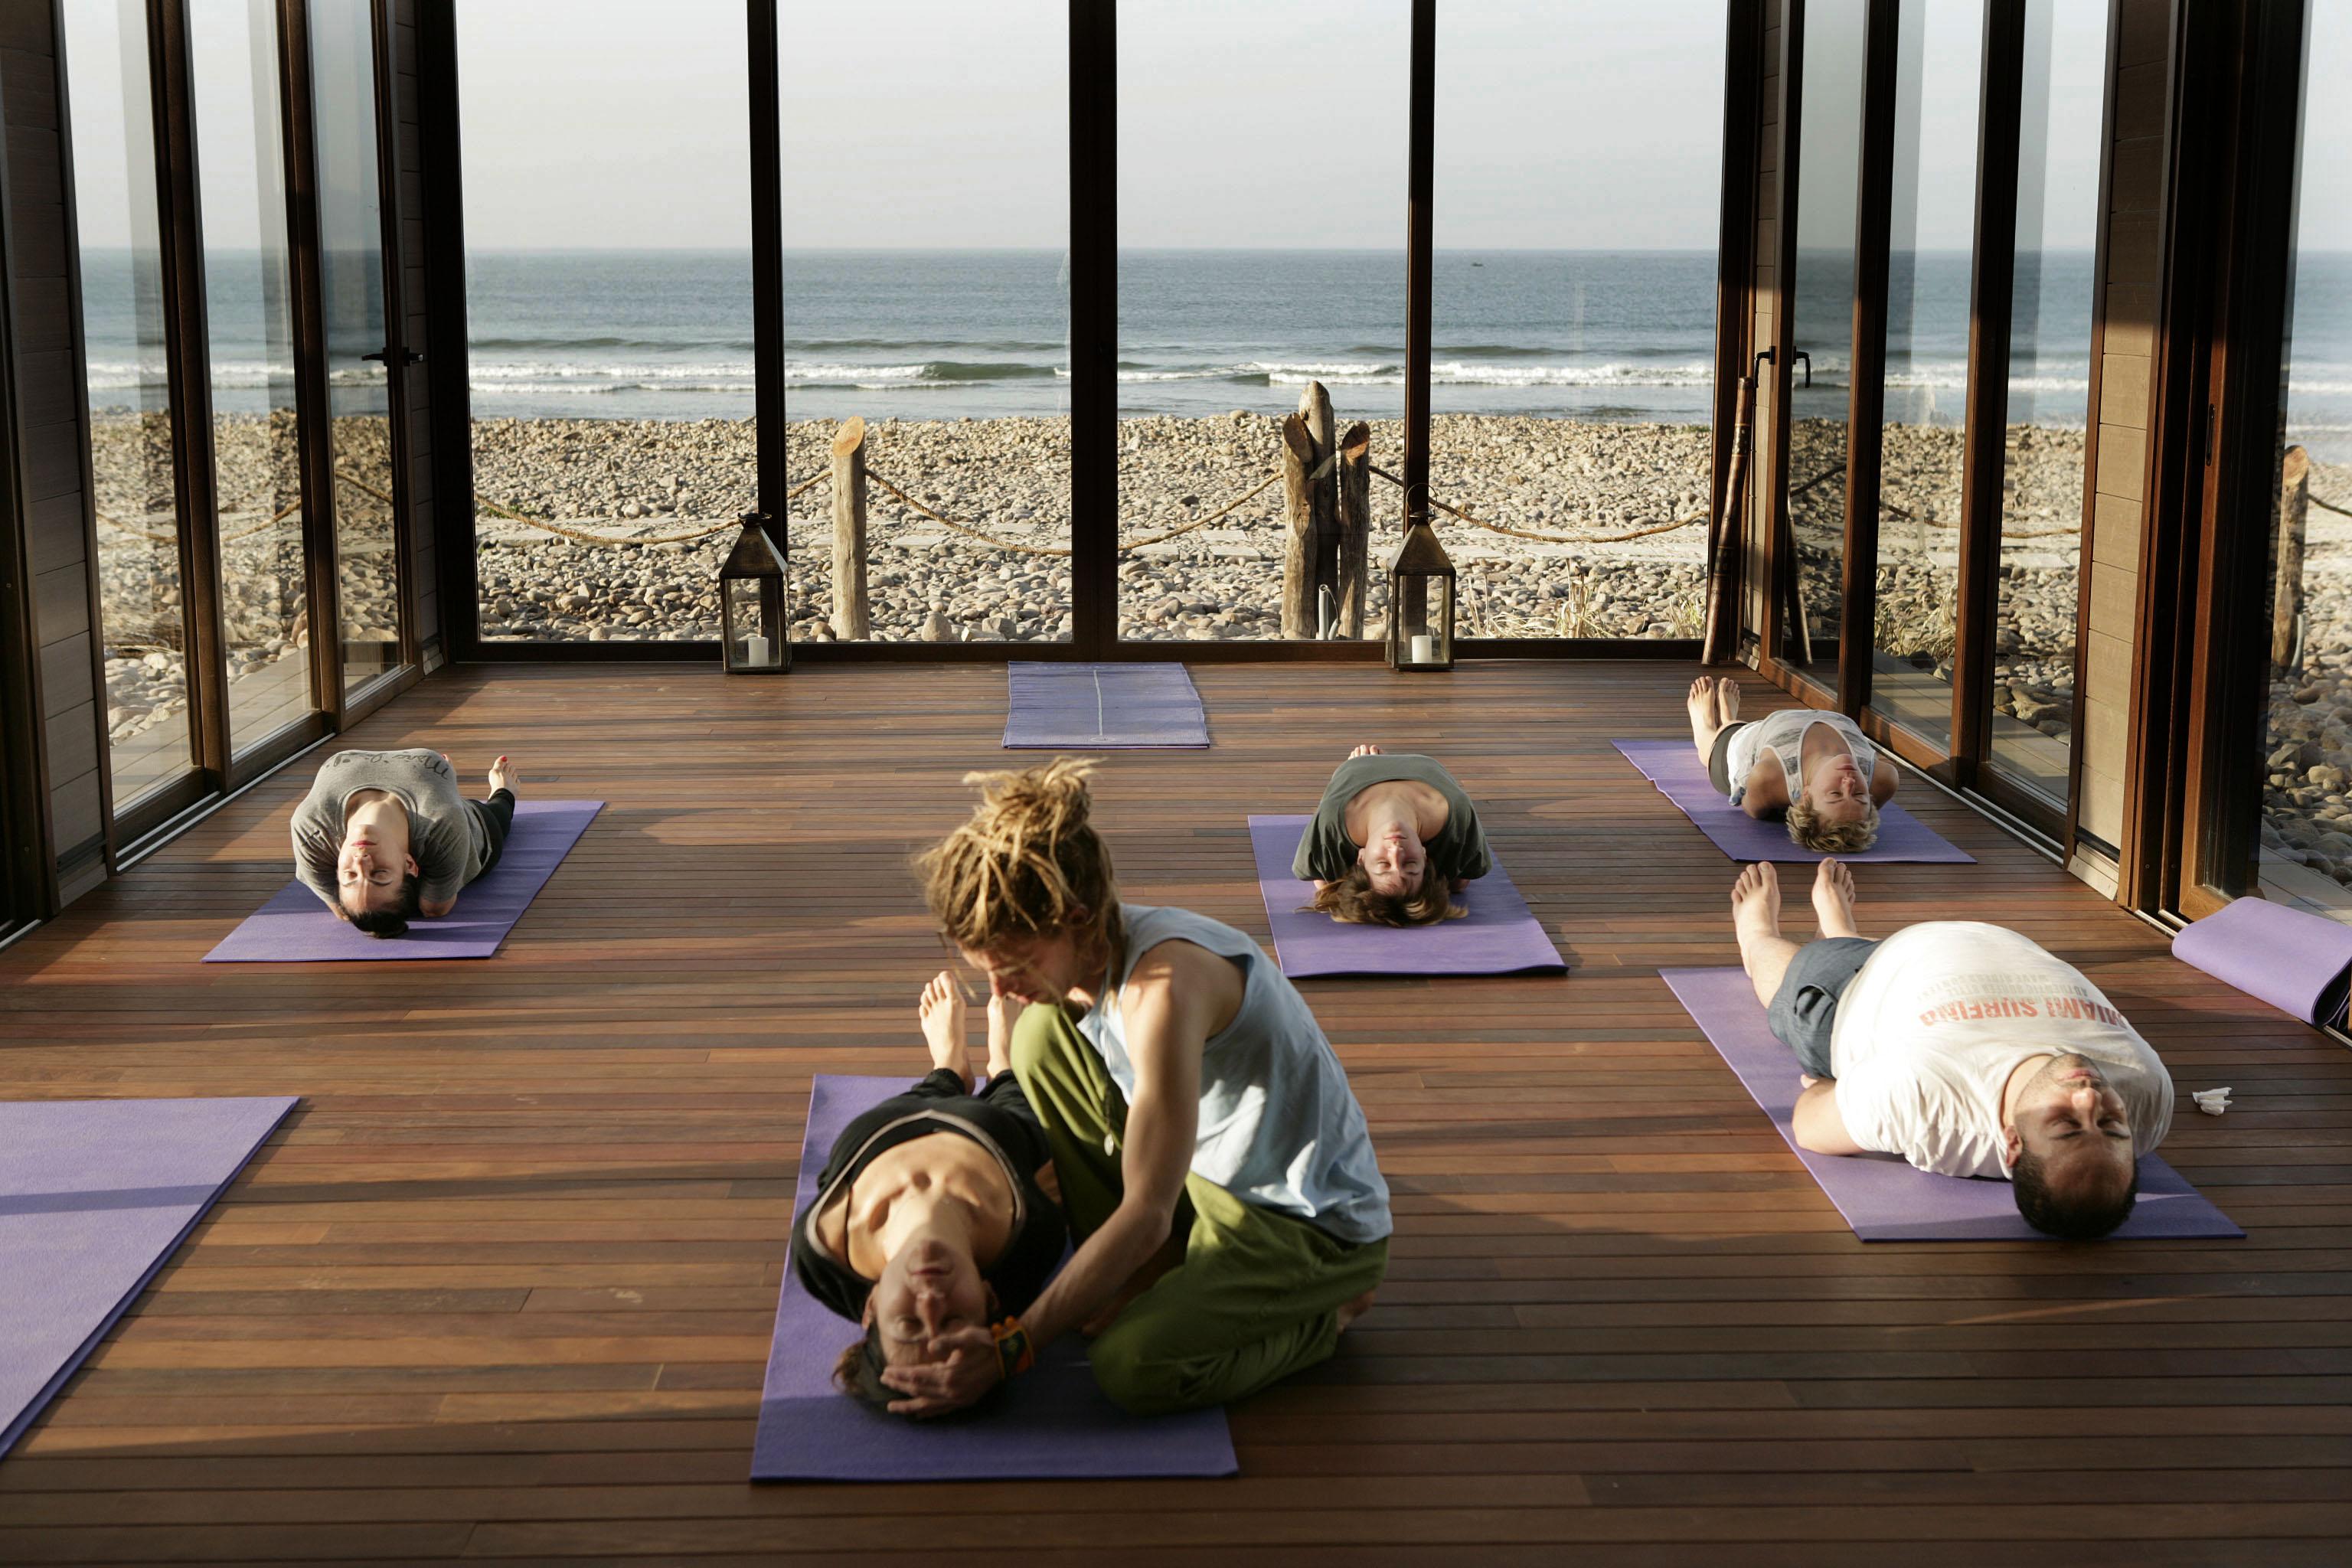 detination yoga at Paradis Plage, healthista